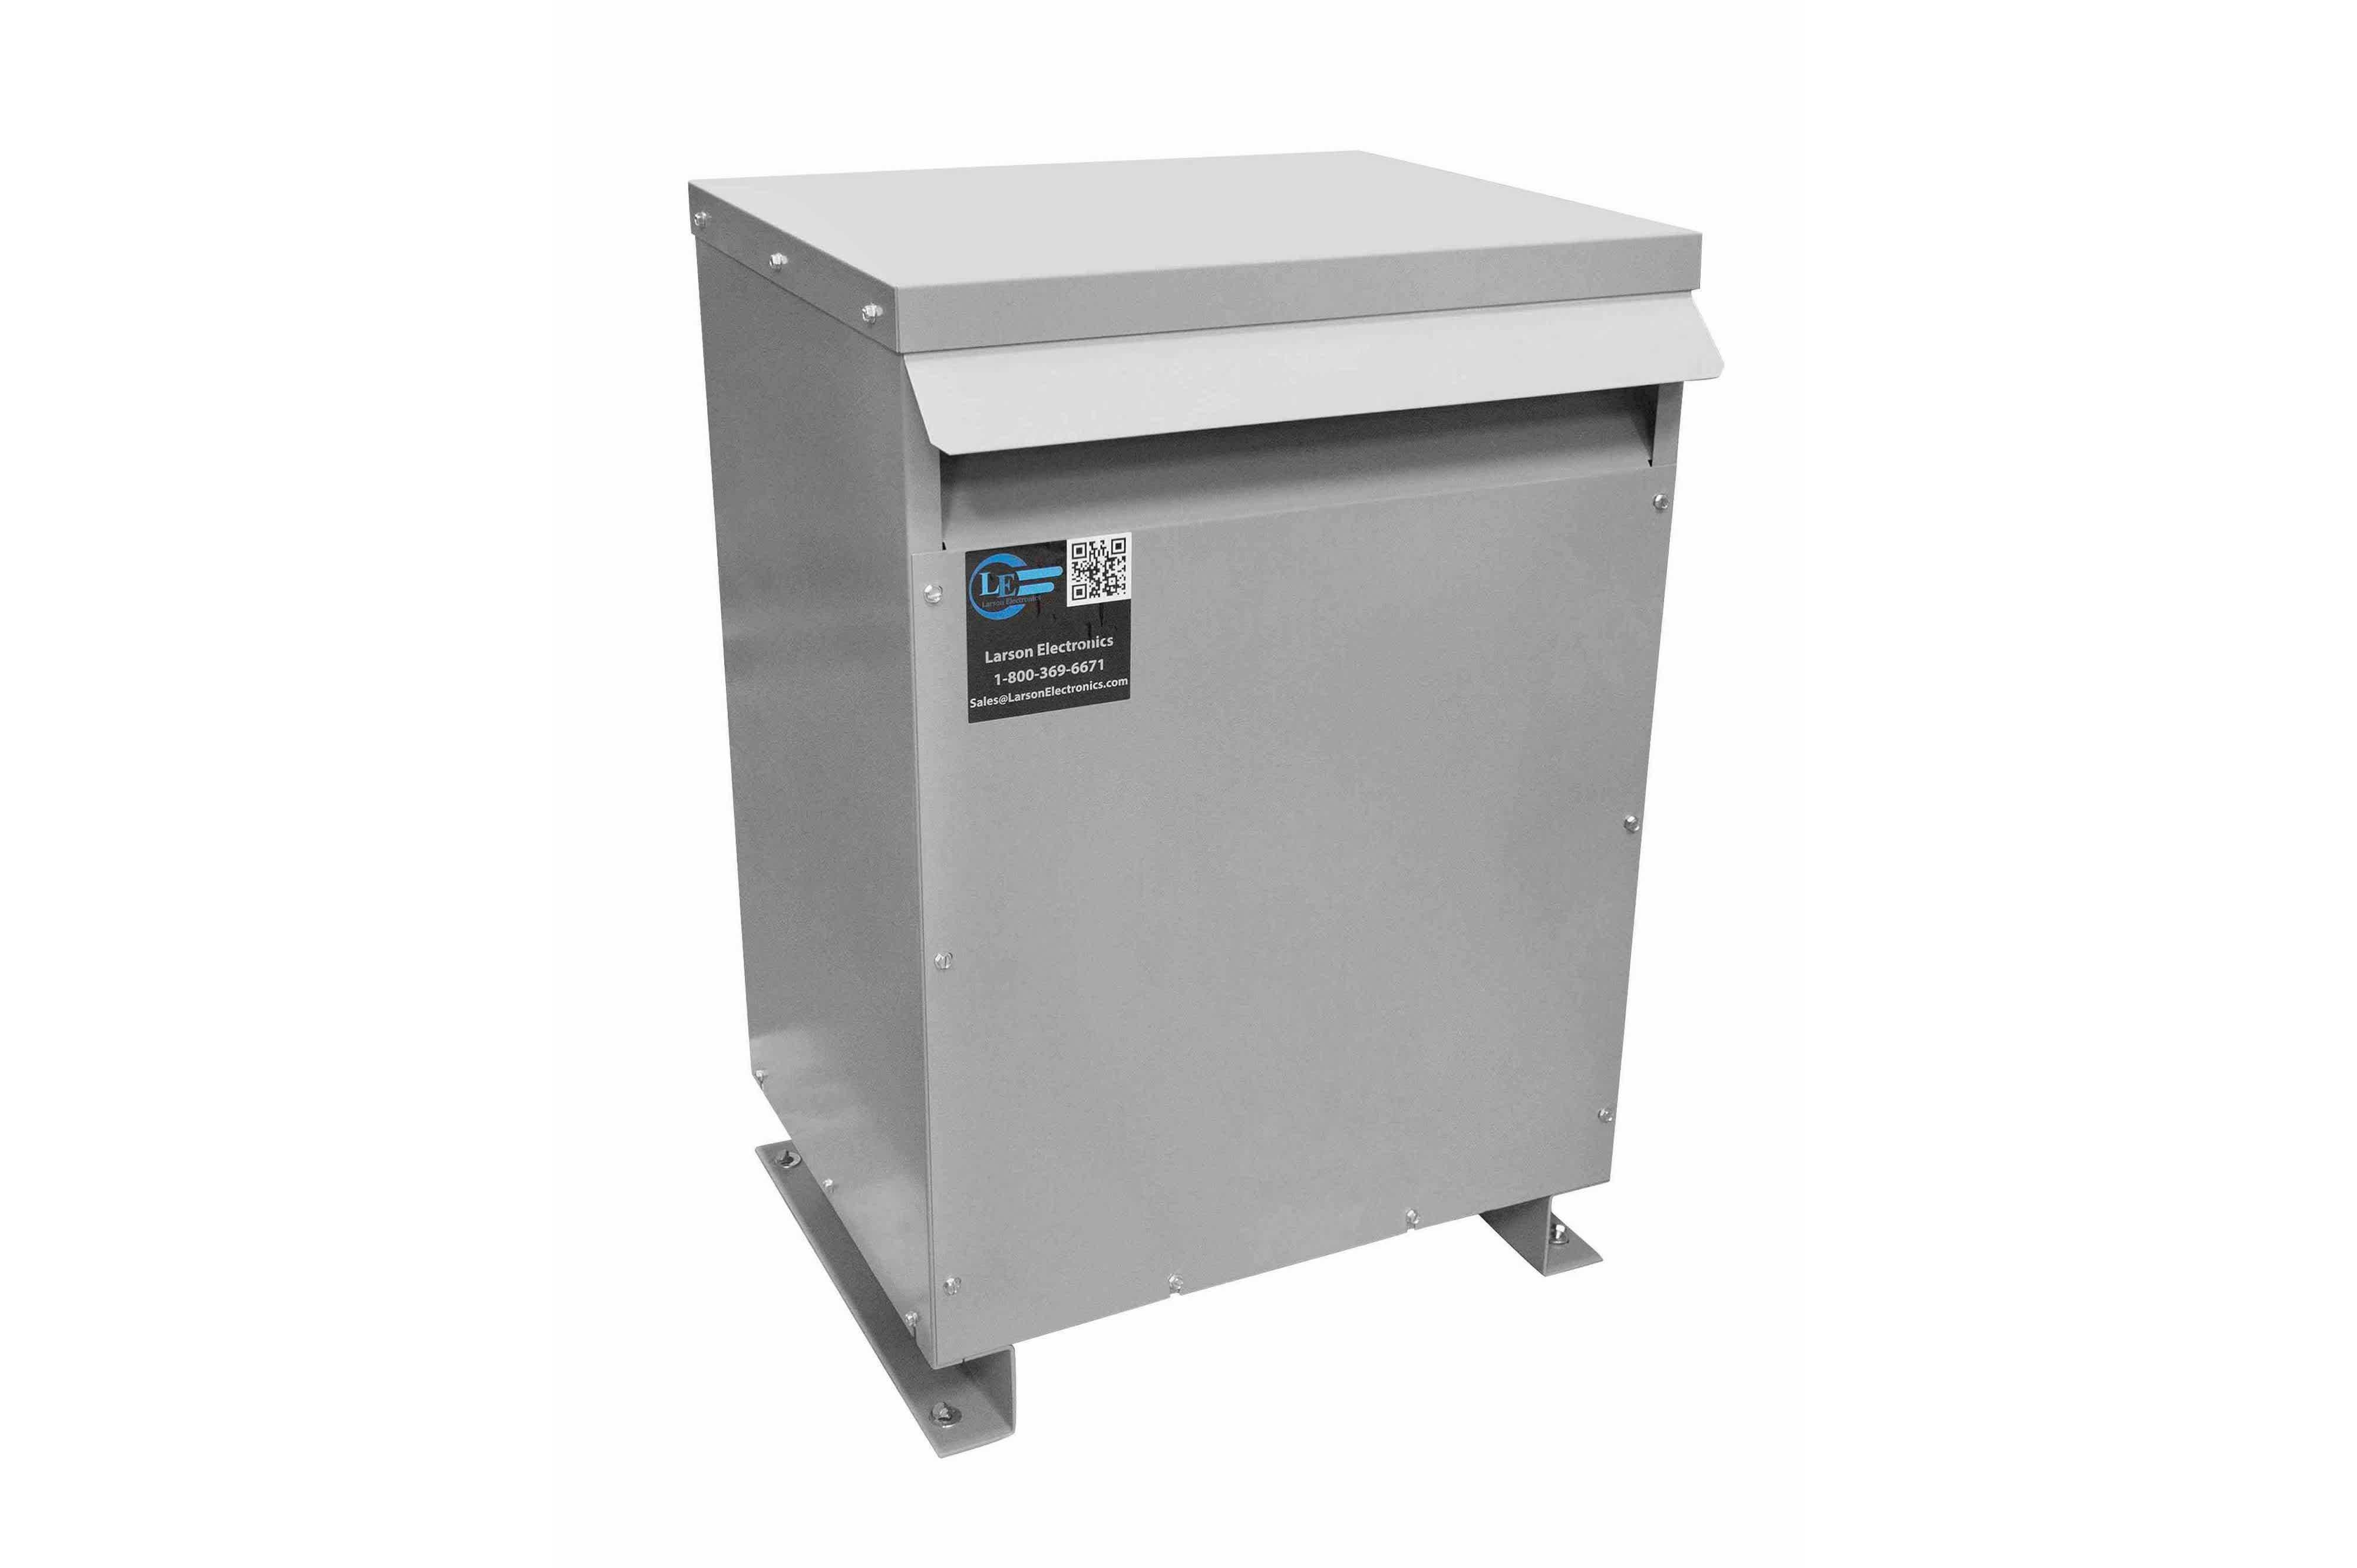 25 kVA 3PH DOE Transformer, 208V Delta Primary, 208Y/120 Wye-N Secondary, N3R, Ventilated, 60 Hz